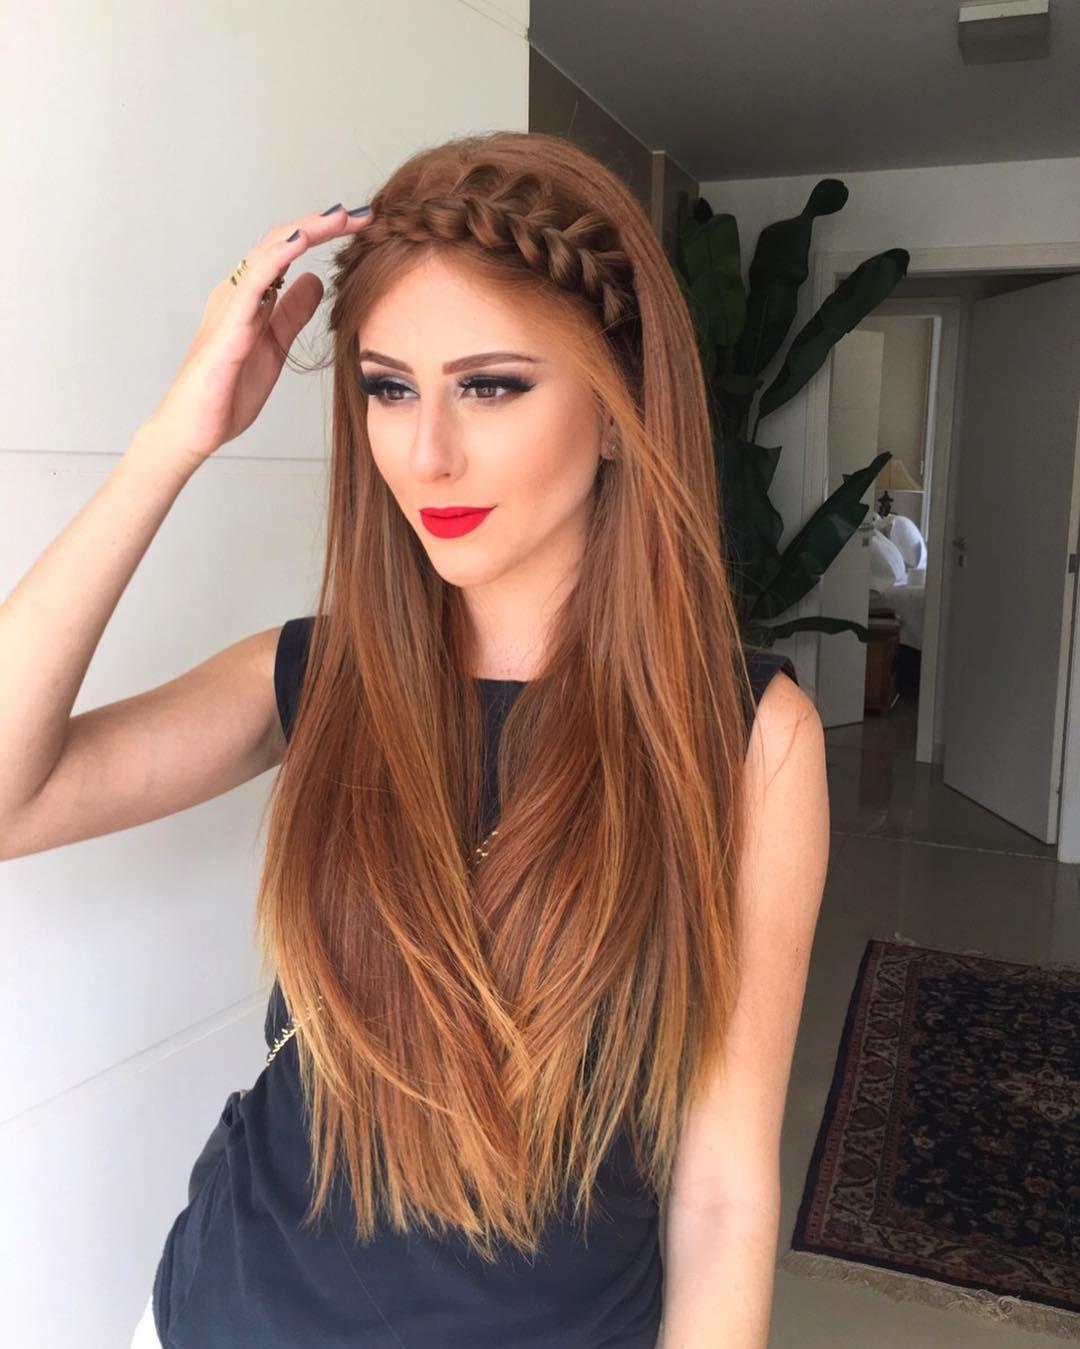 Mari Maria Makeup Em Arco De Tran 231 A Braid Long Hair